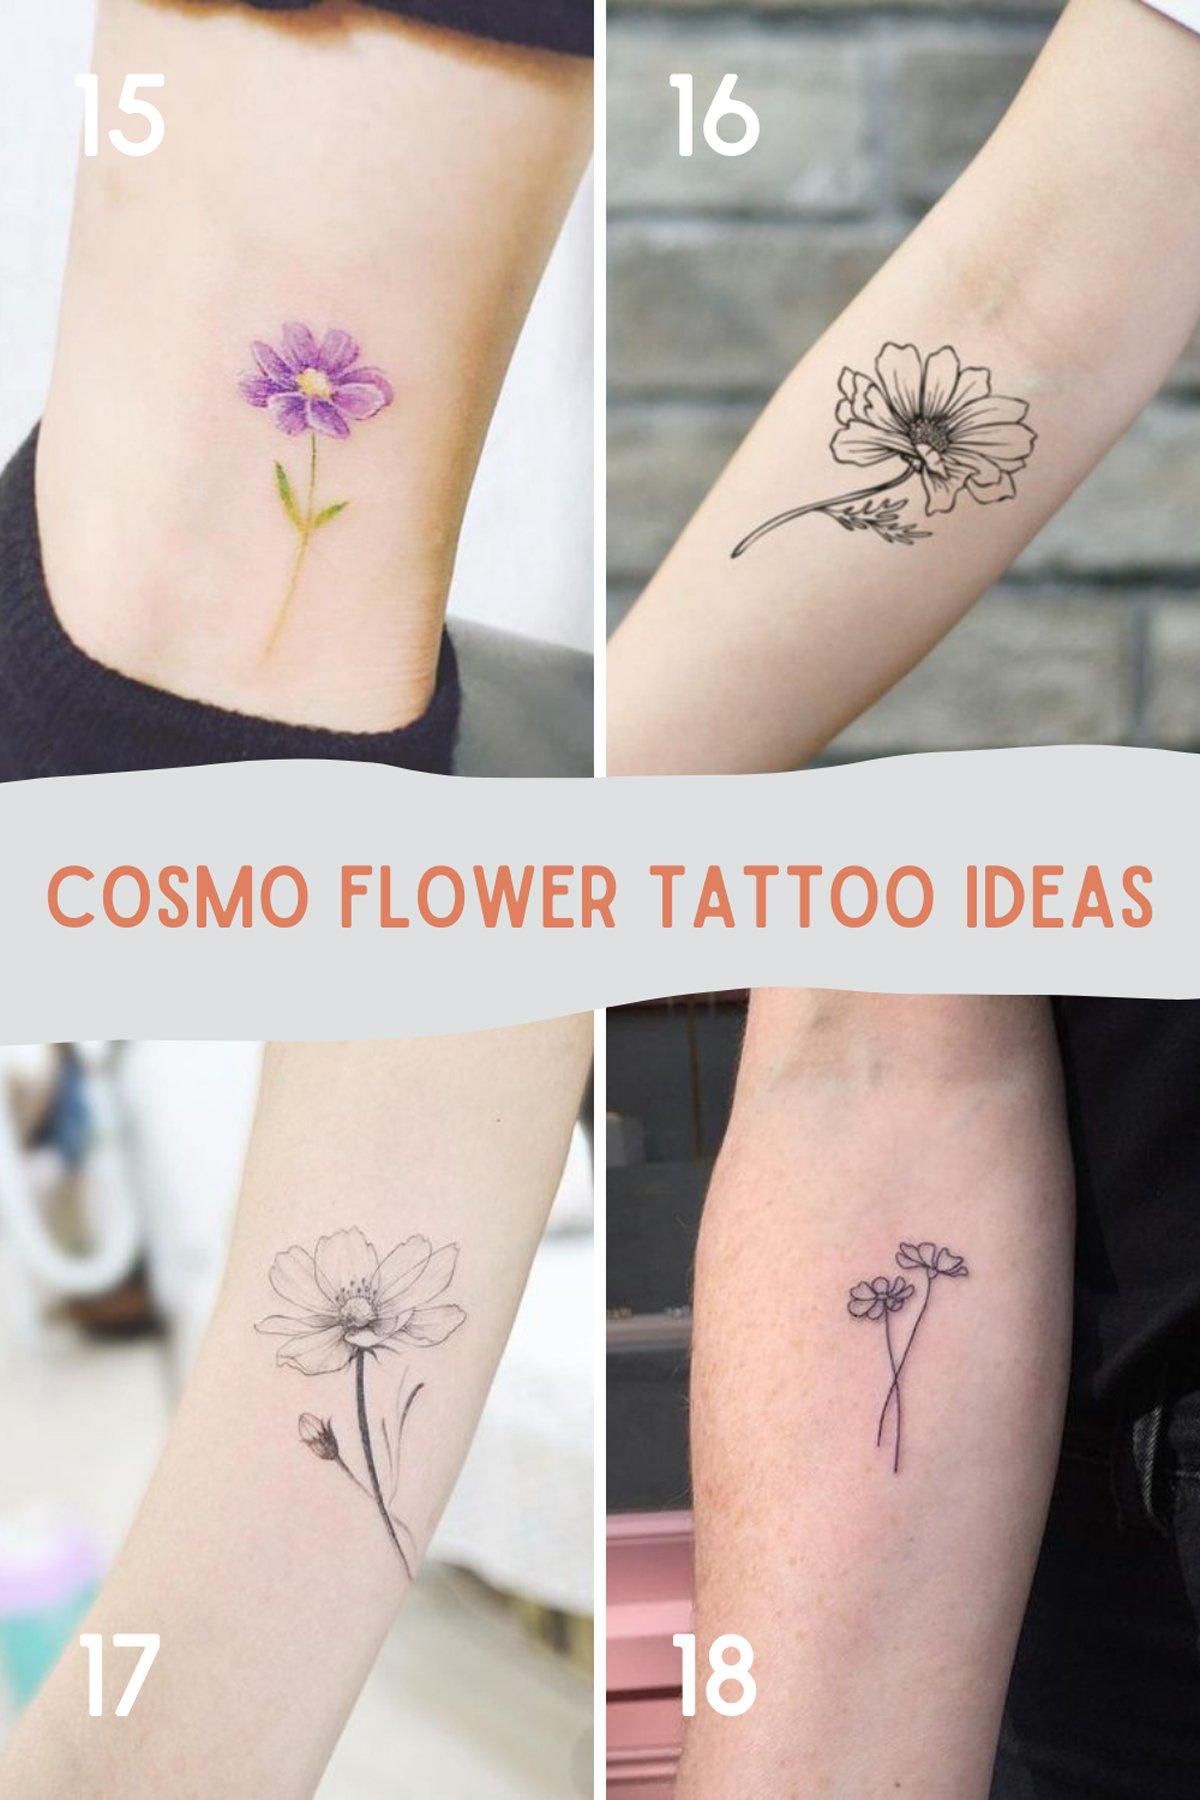 Cosmo Flower Tattoo Ideas